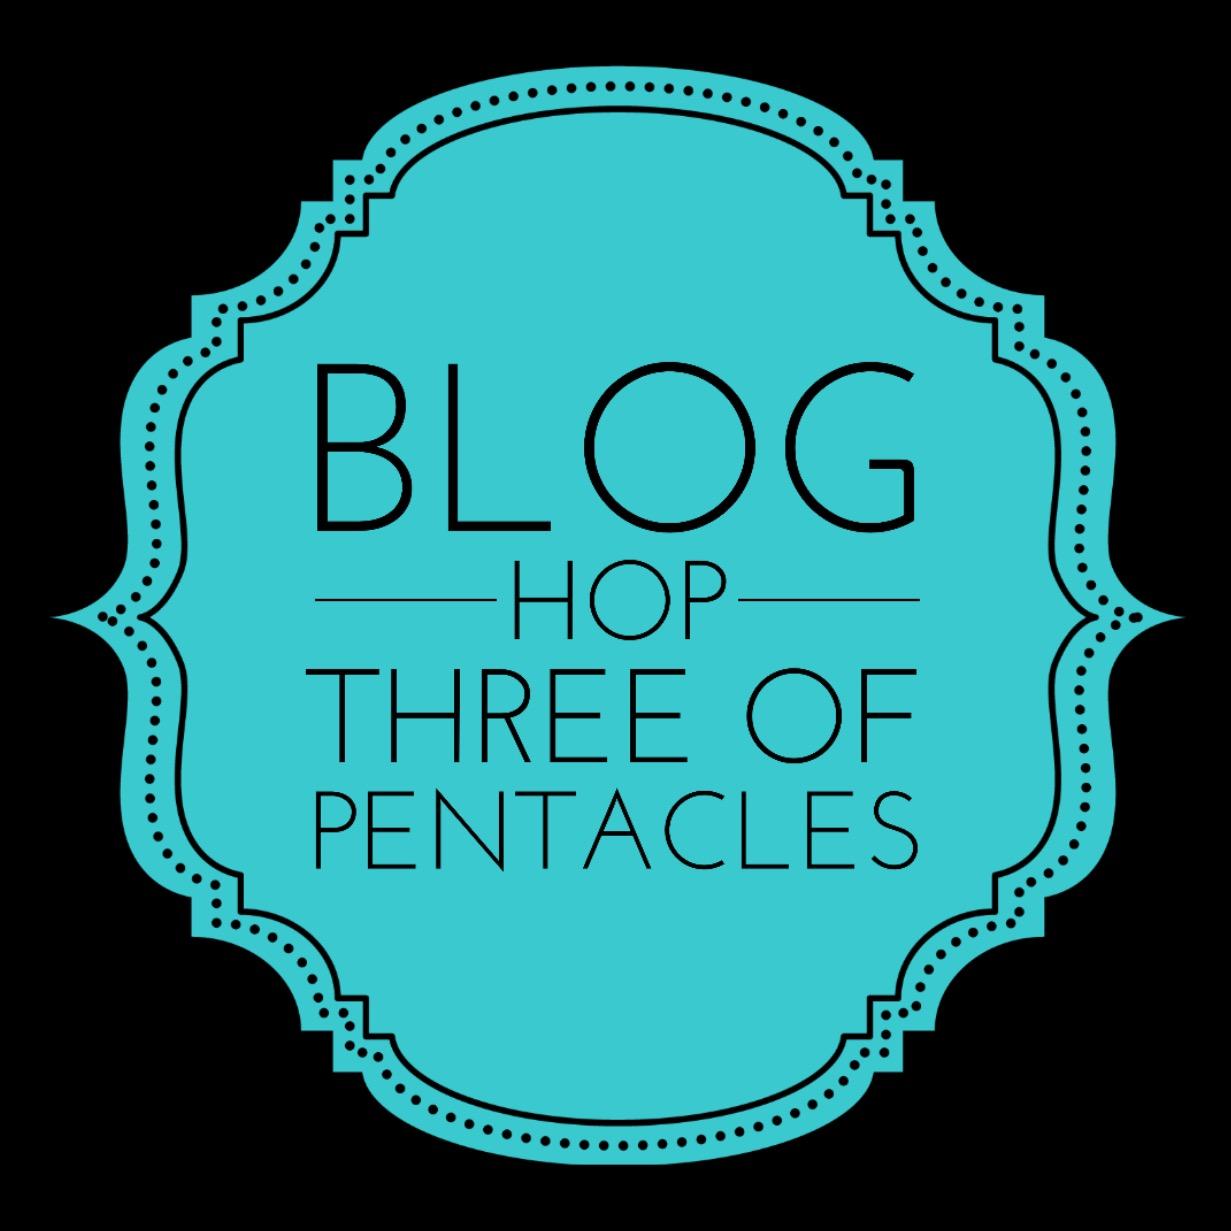 International Tarot Day Blog Hop Three of Pentacles - Tarot Liza